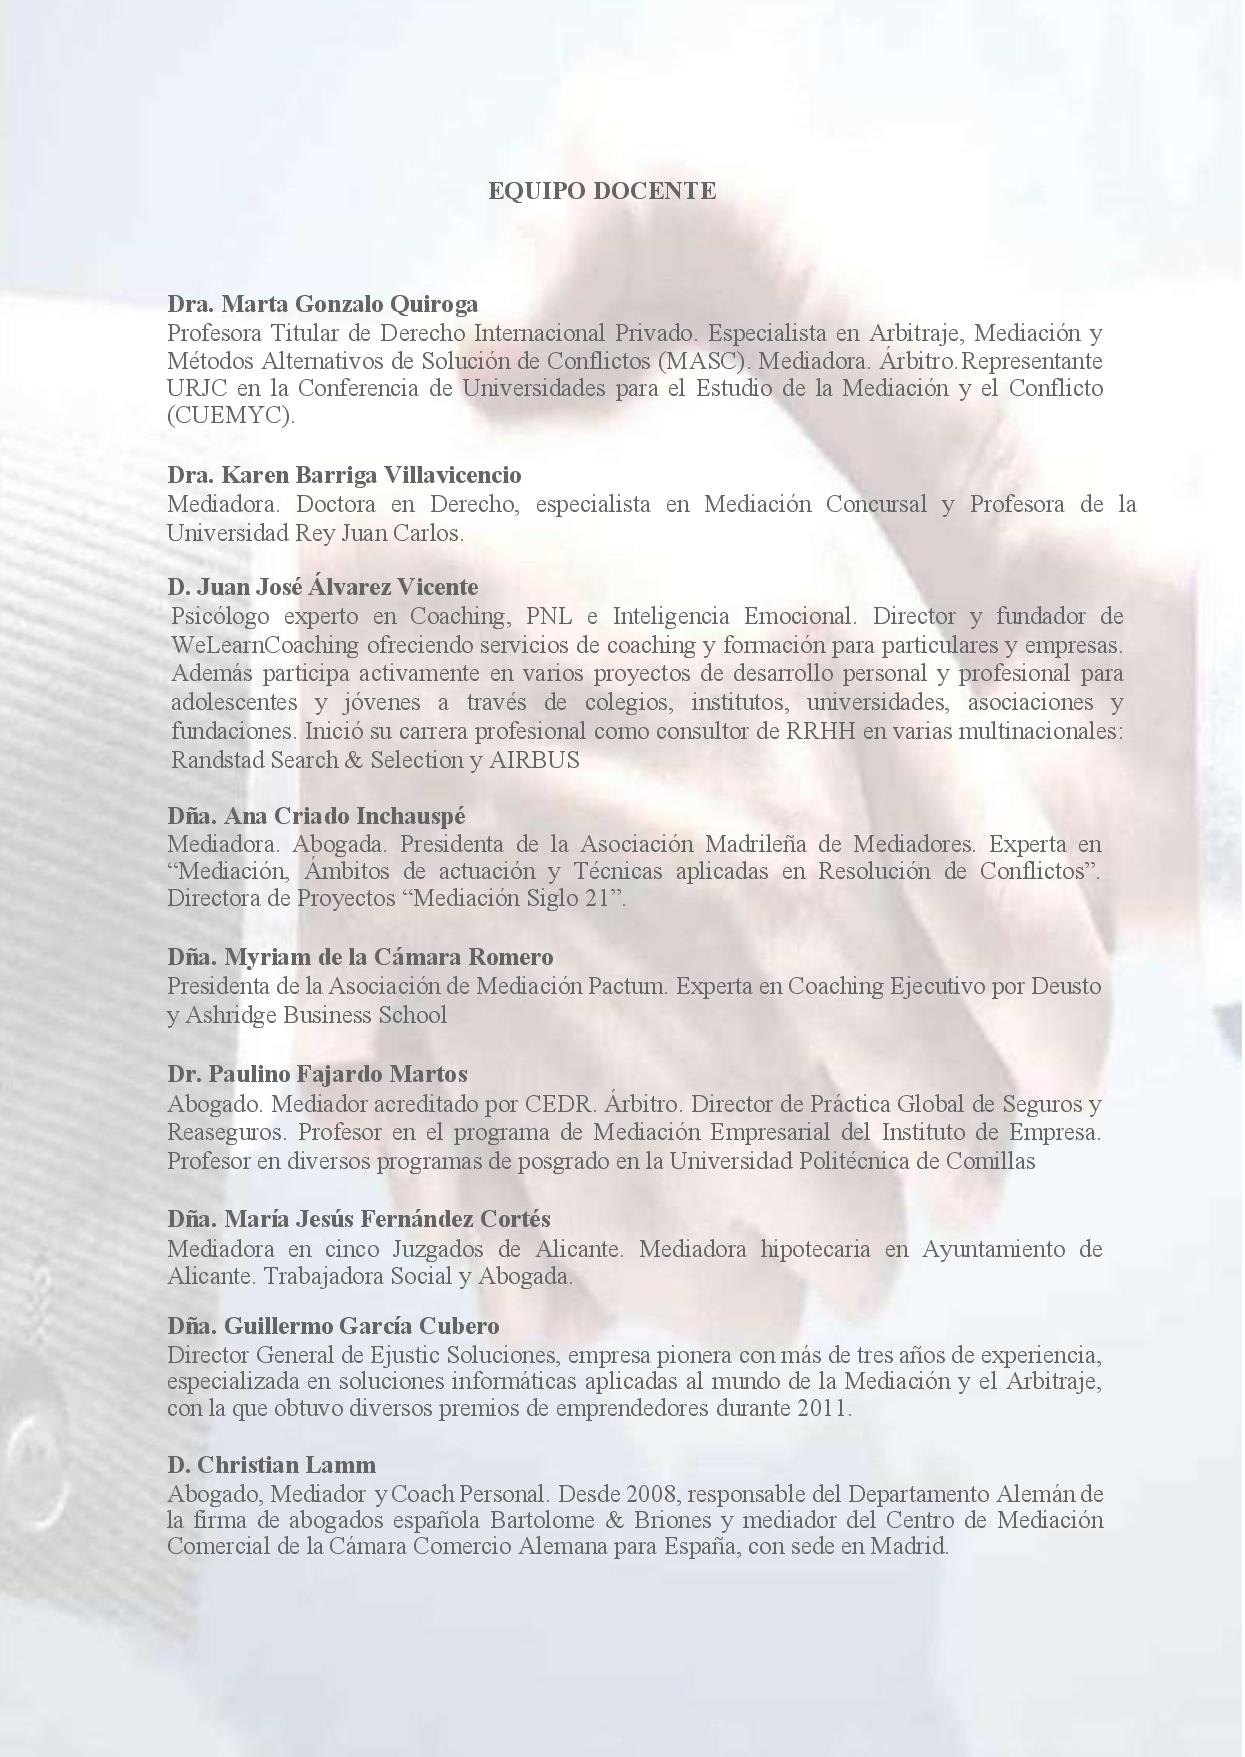 Programa-page-007